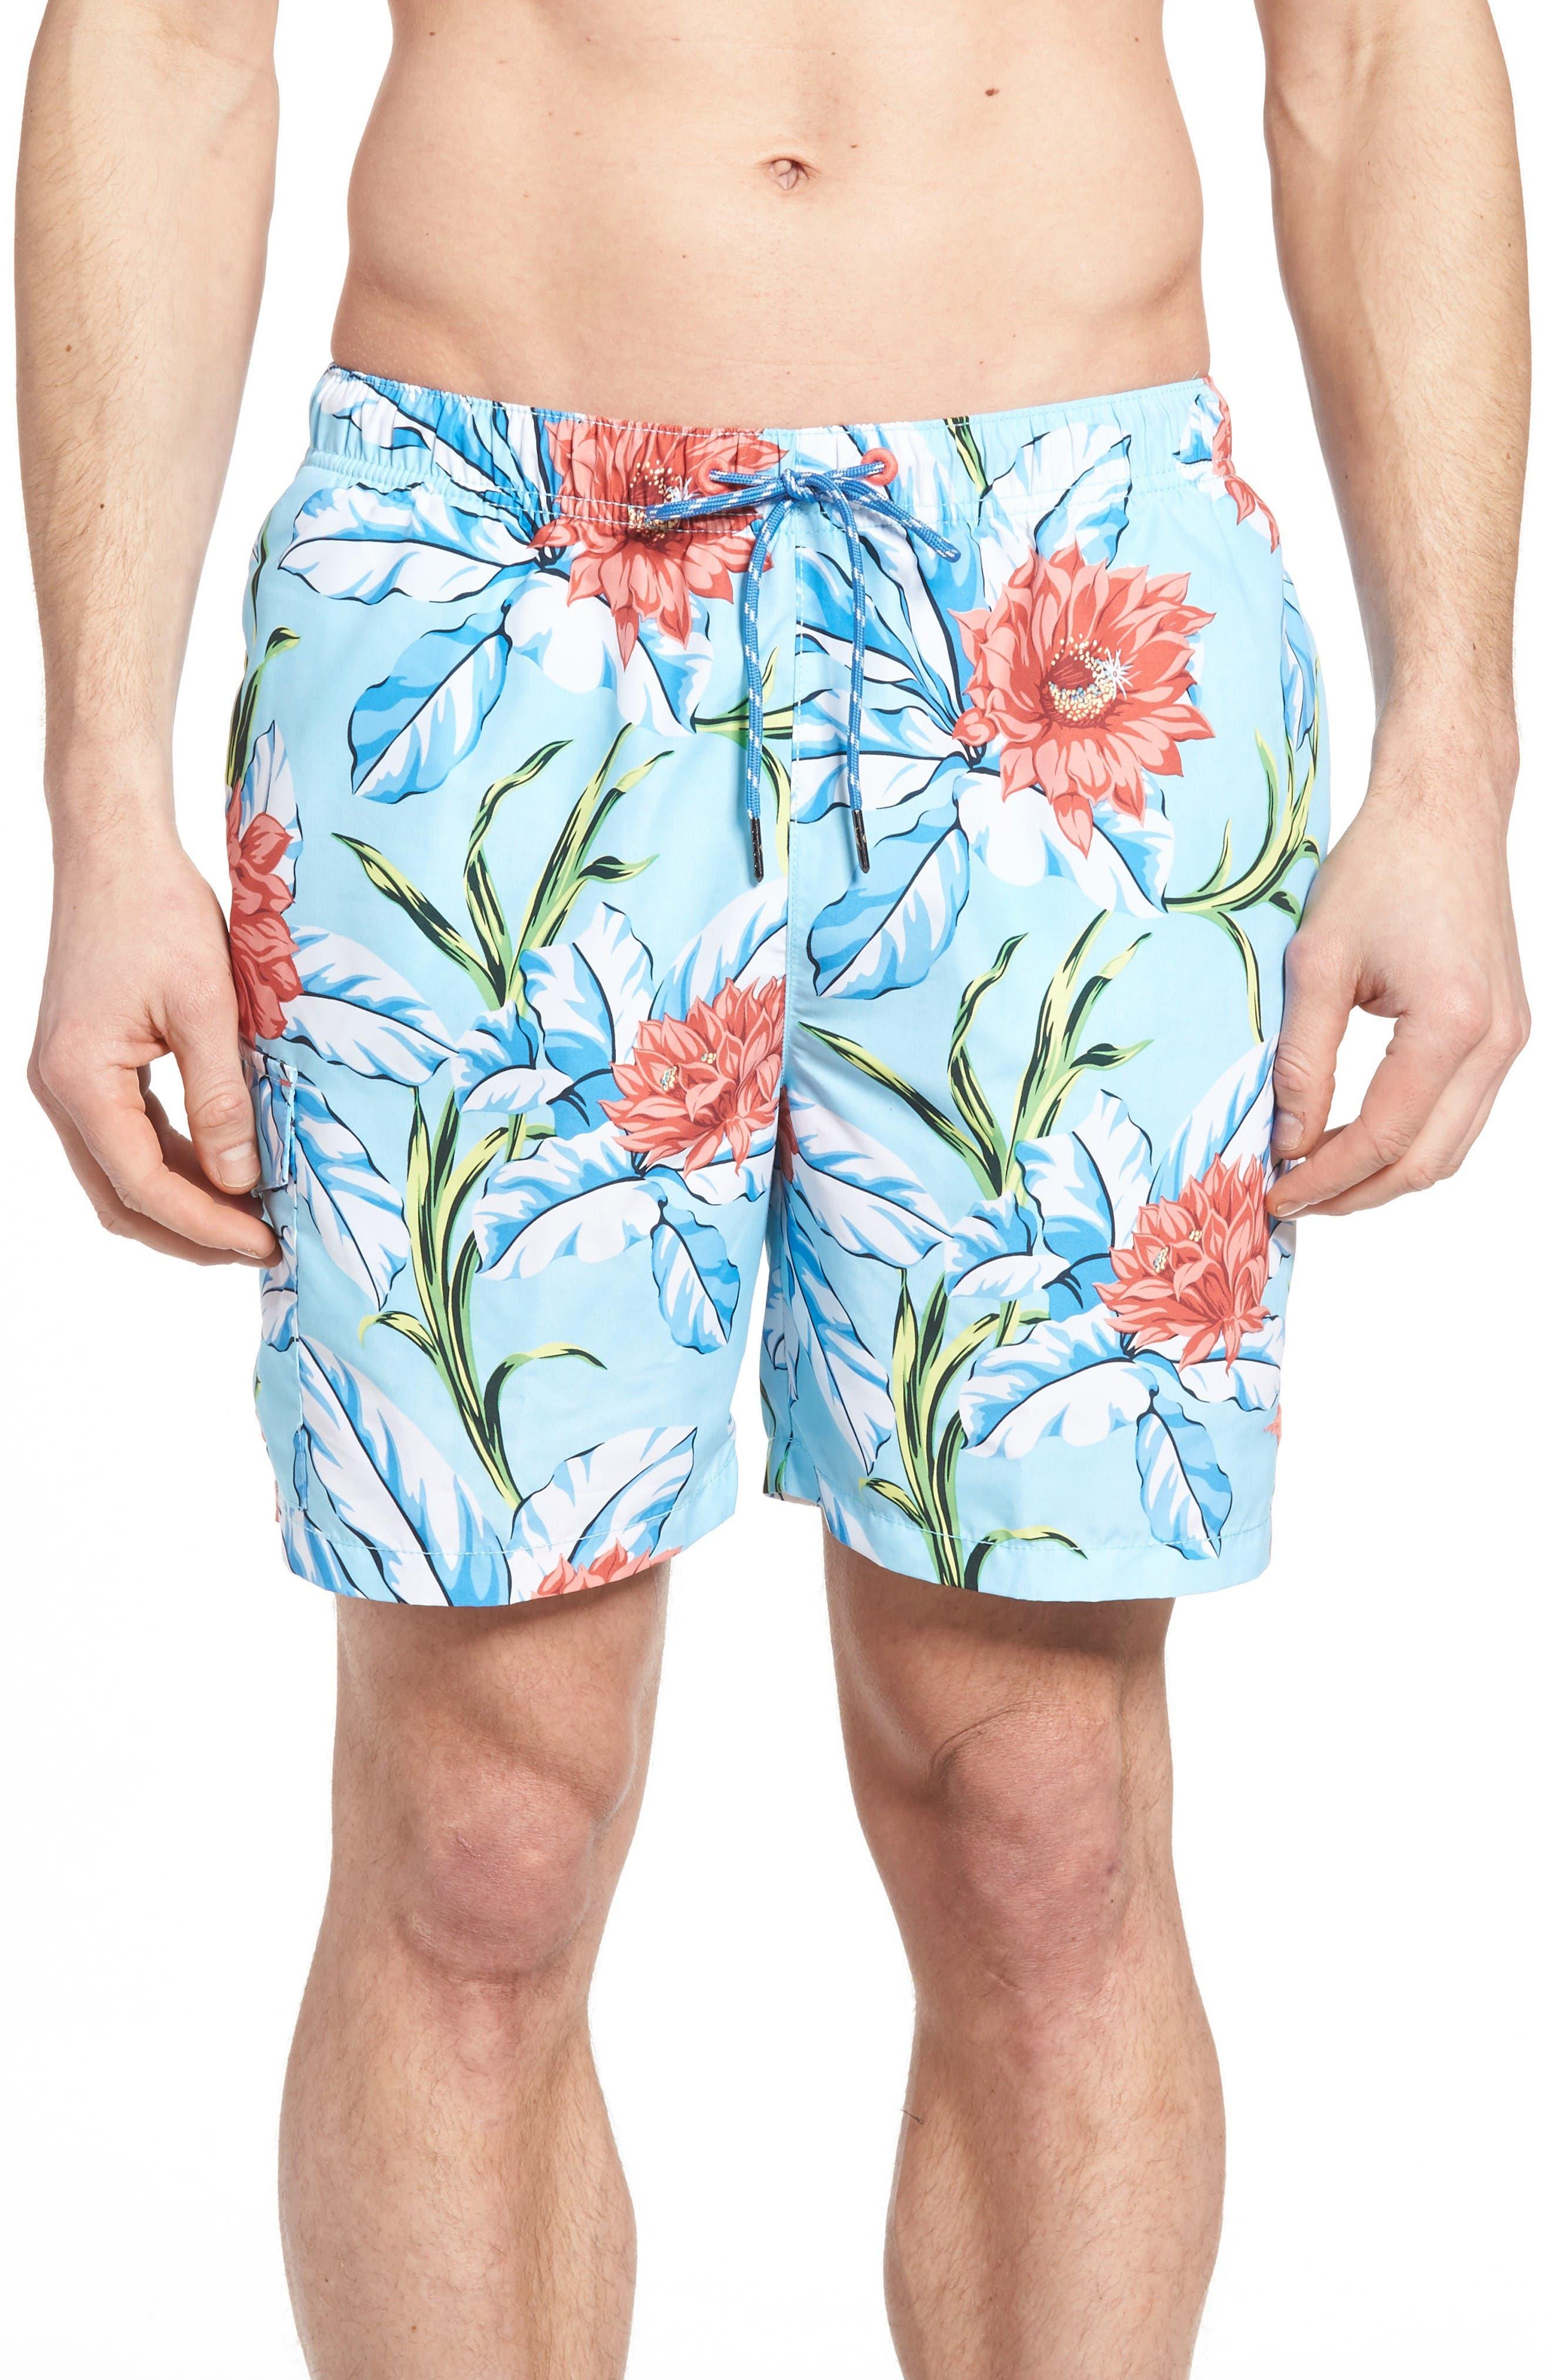 Naples Fira Floral Swim Trunks,                             Main thumbnail 1, color,                             Shasta